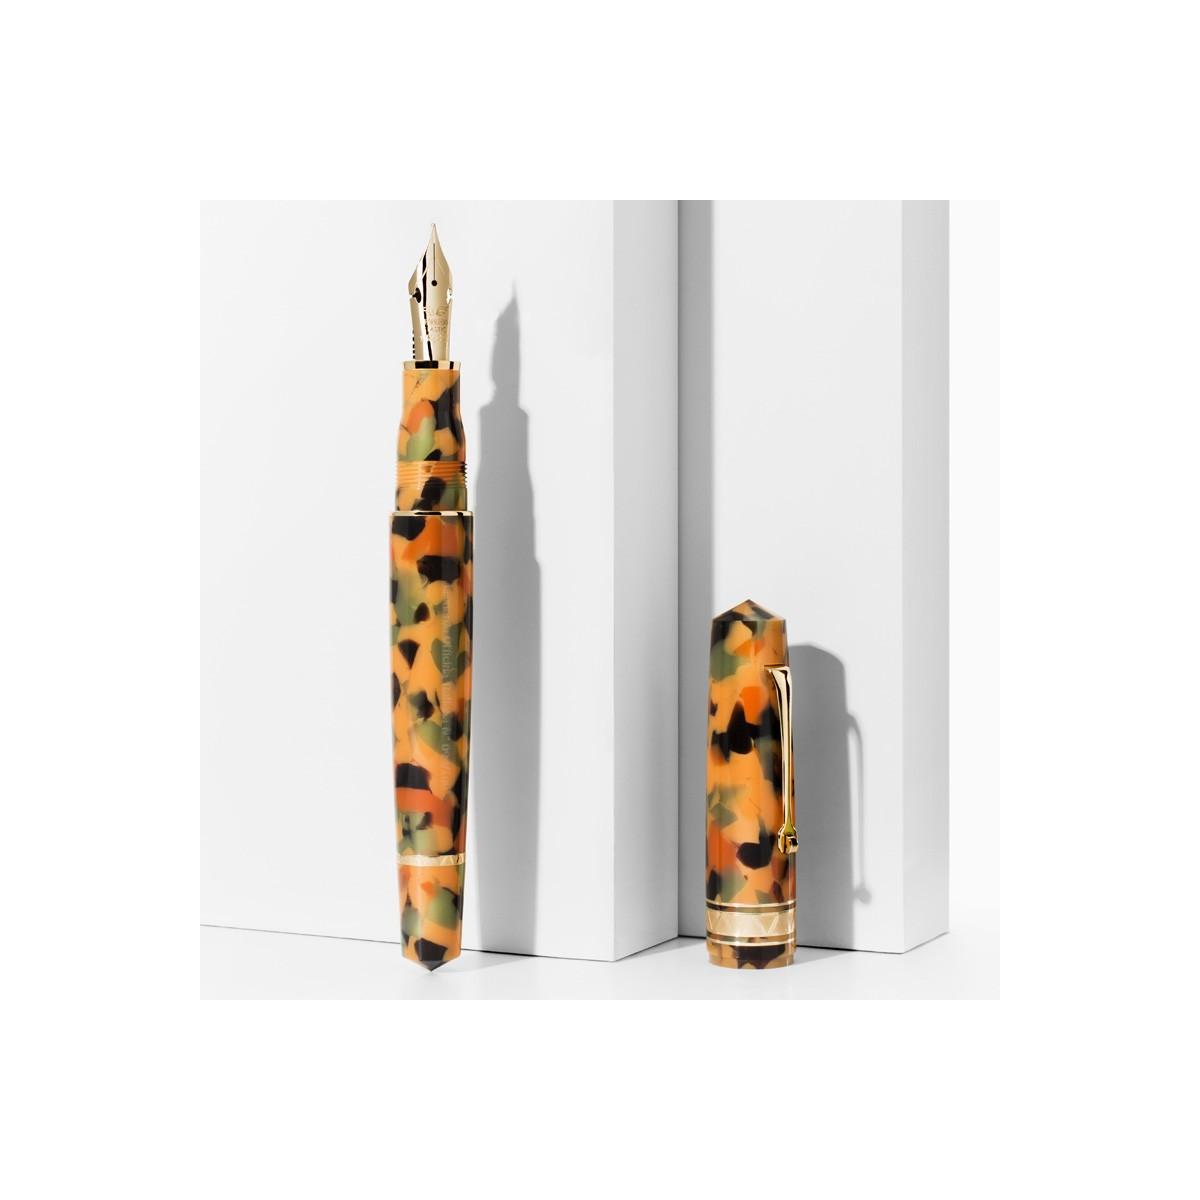 Leonardo Officina Italiana - Momento Zero Grande Arlecchino - Rhodium trims - Fountain pen